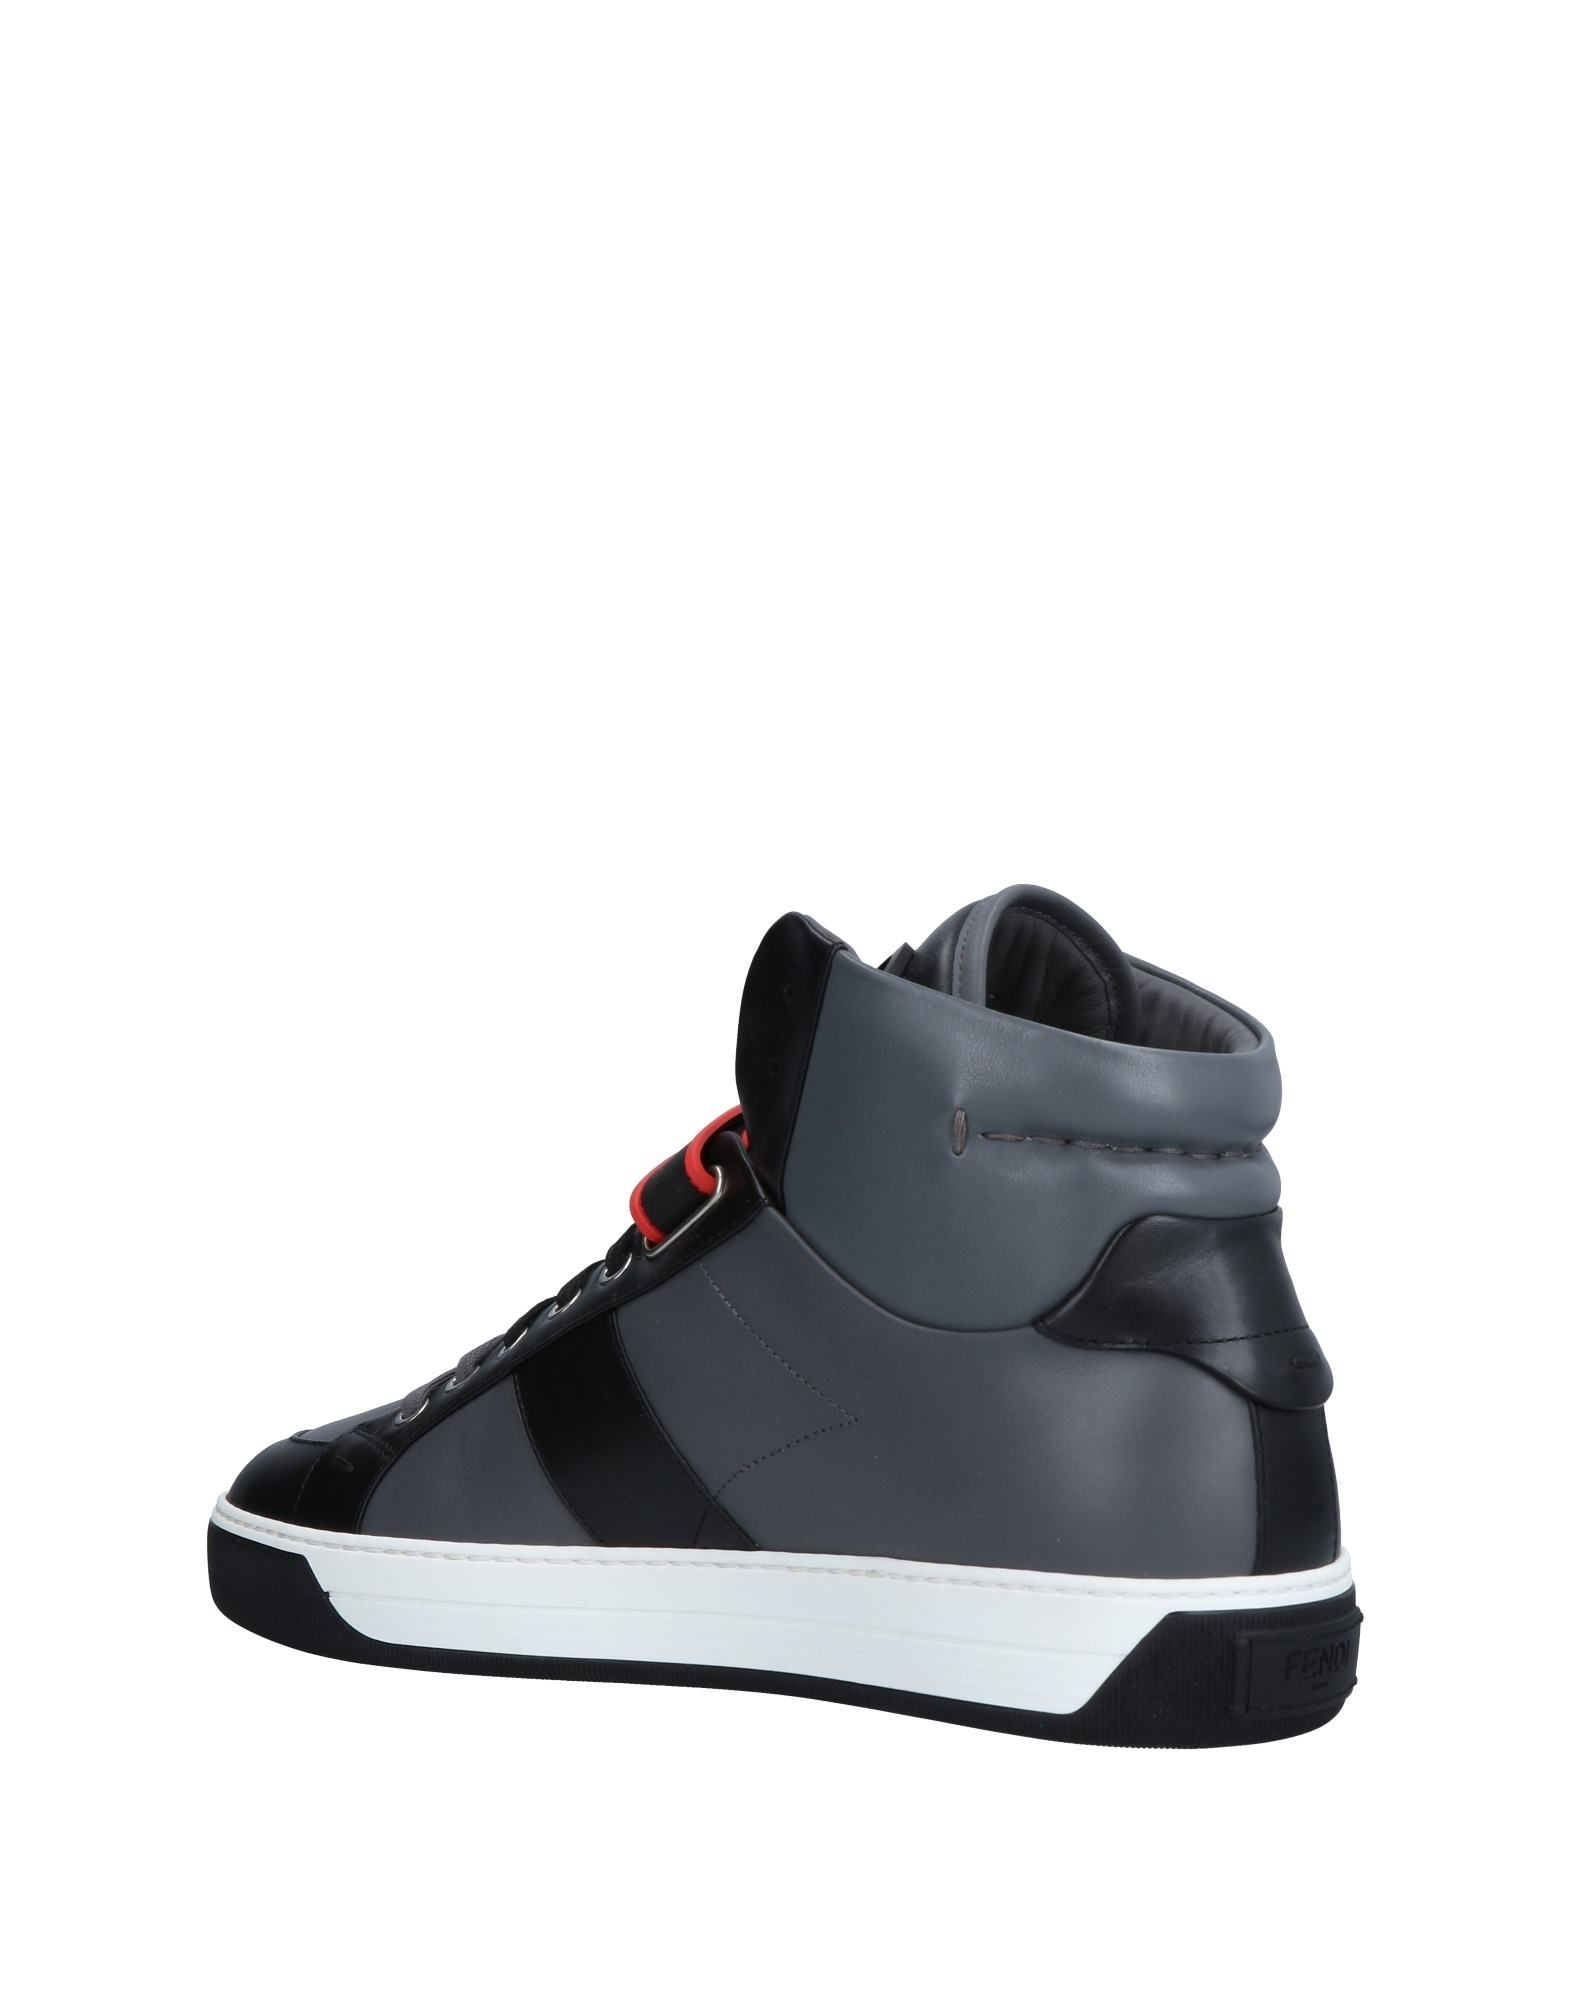 Fendi Sneakers - Men Fendi Sneakers online on    Australia - 11505684UB 566d9f